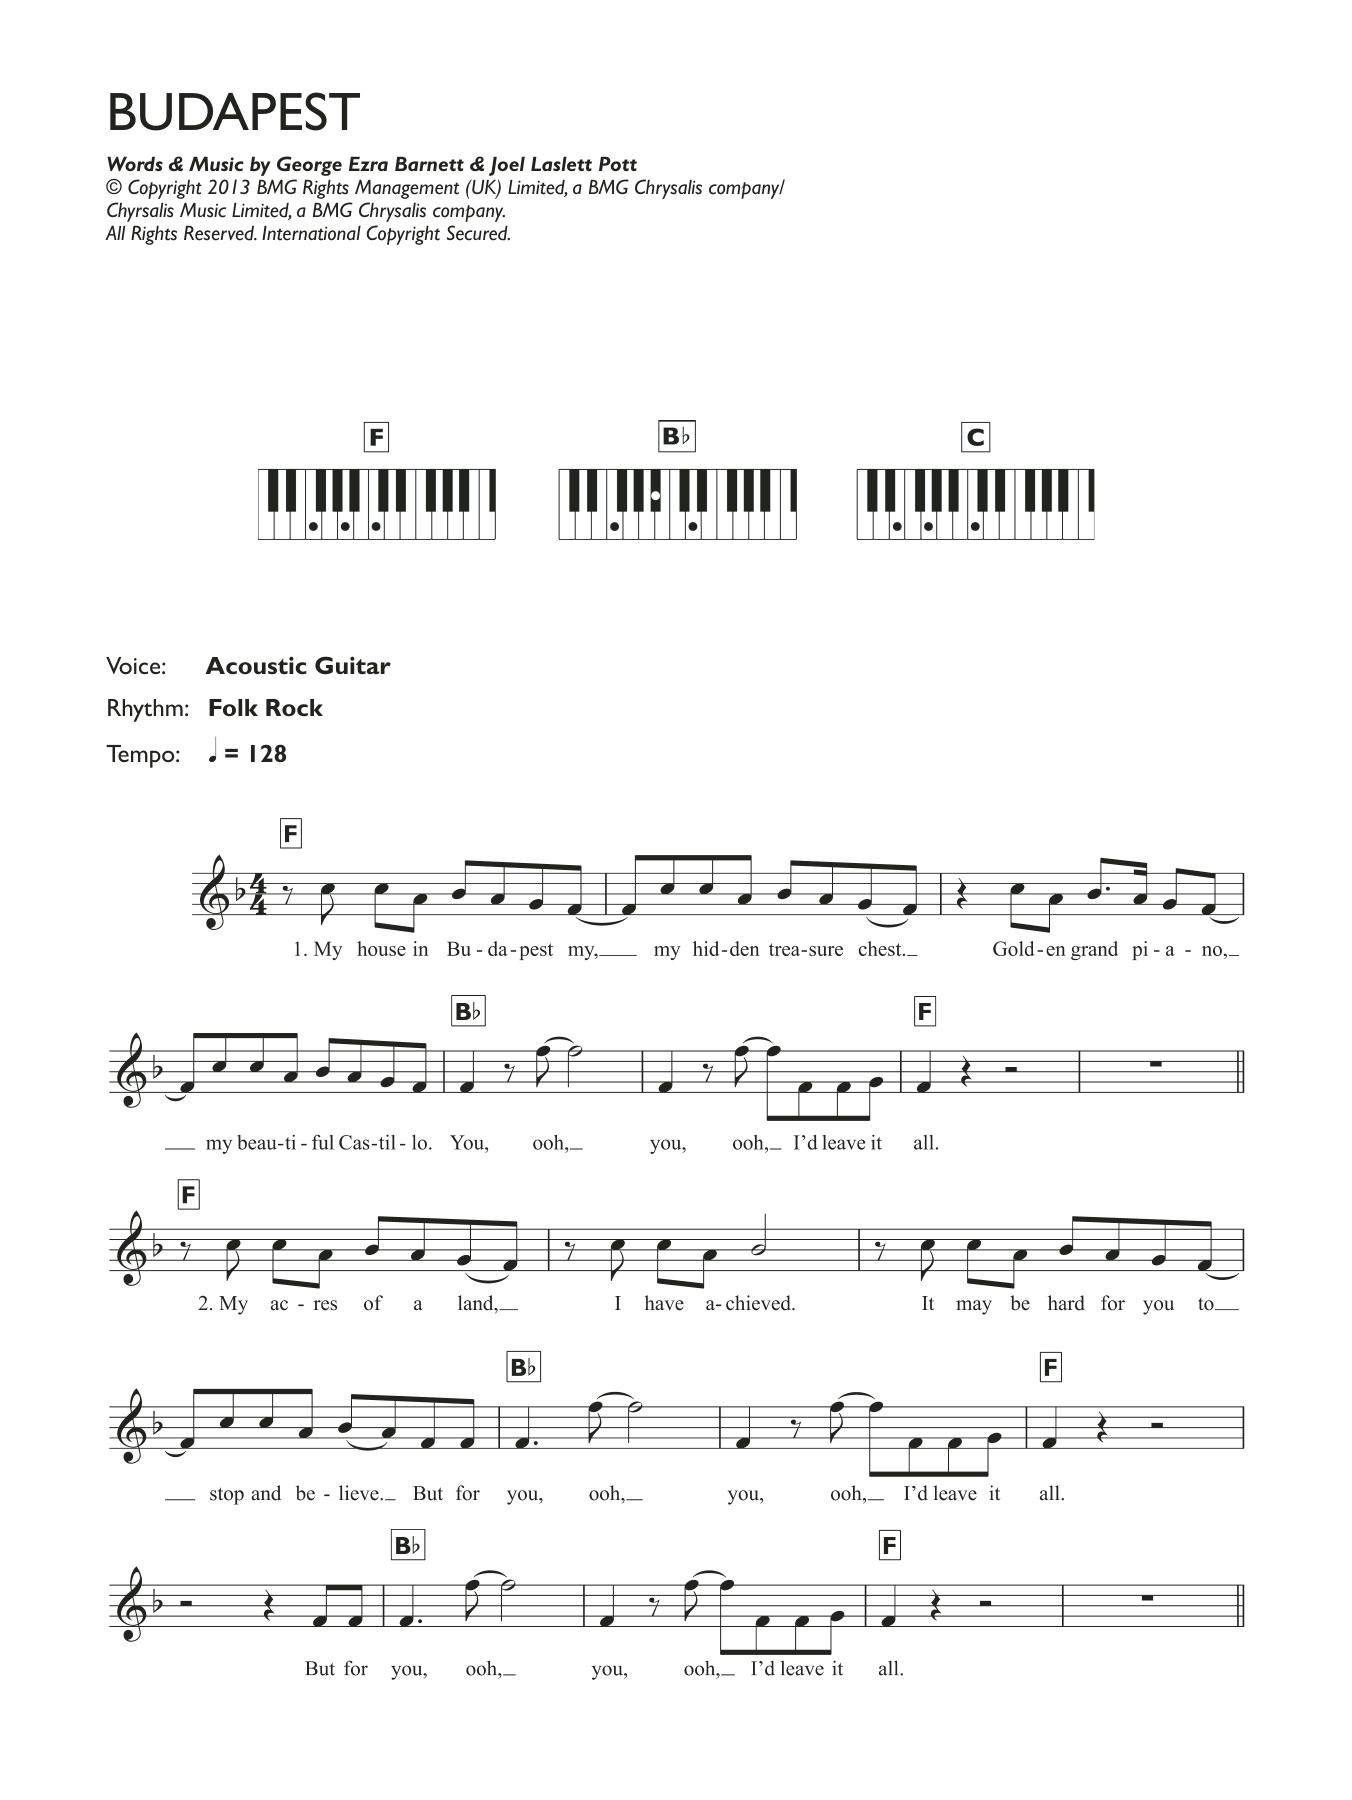 Budapest Sheet Music